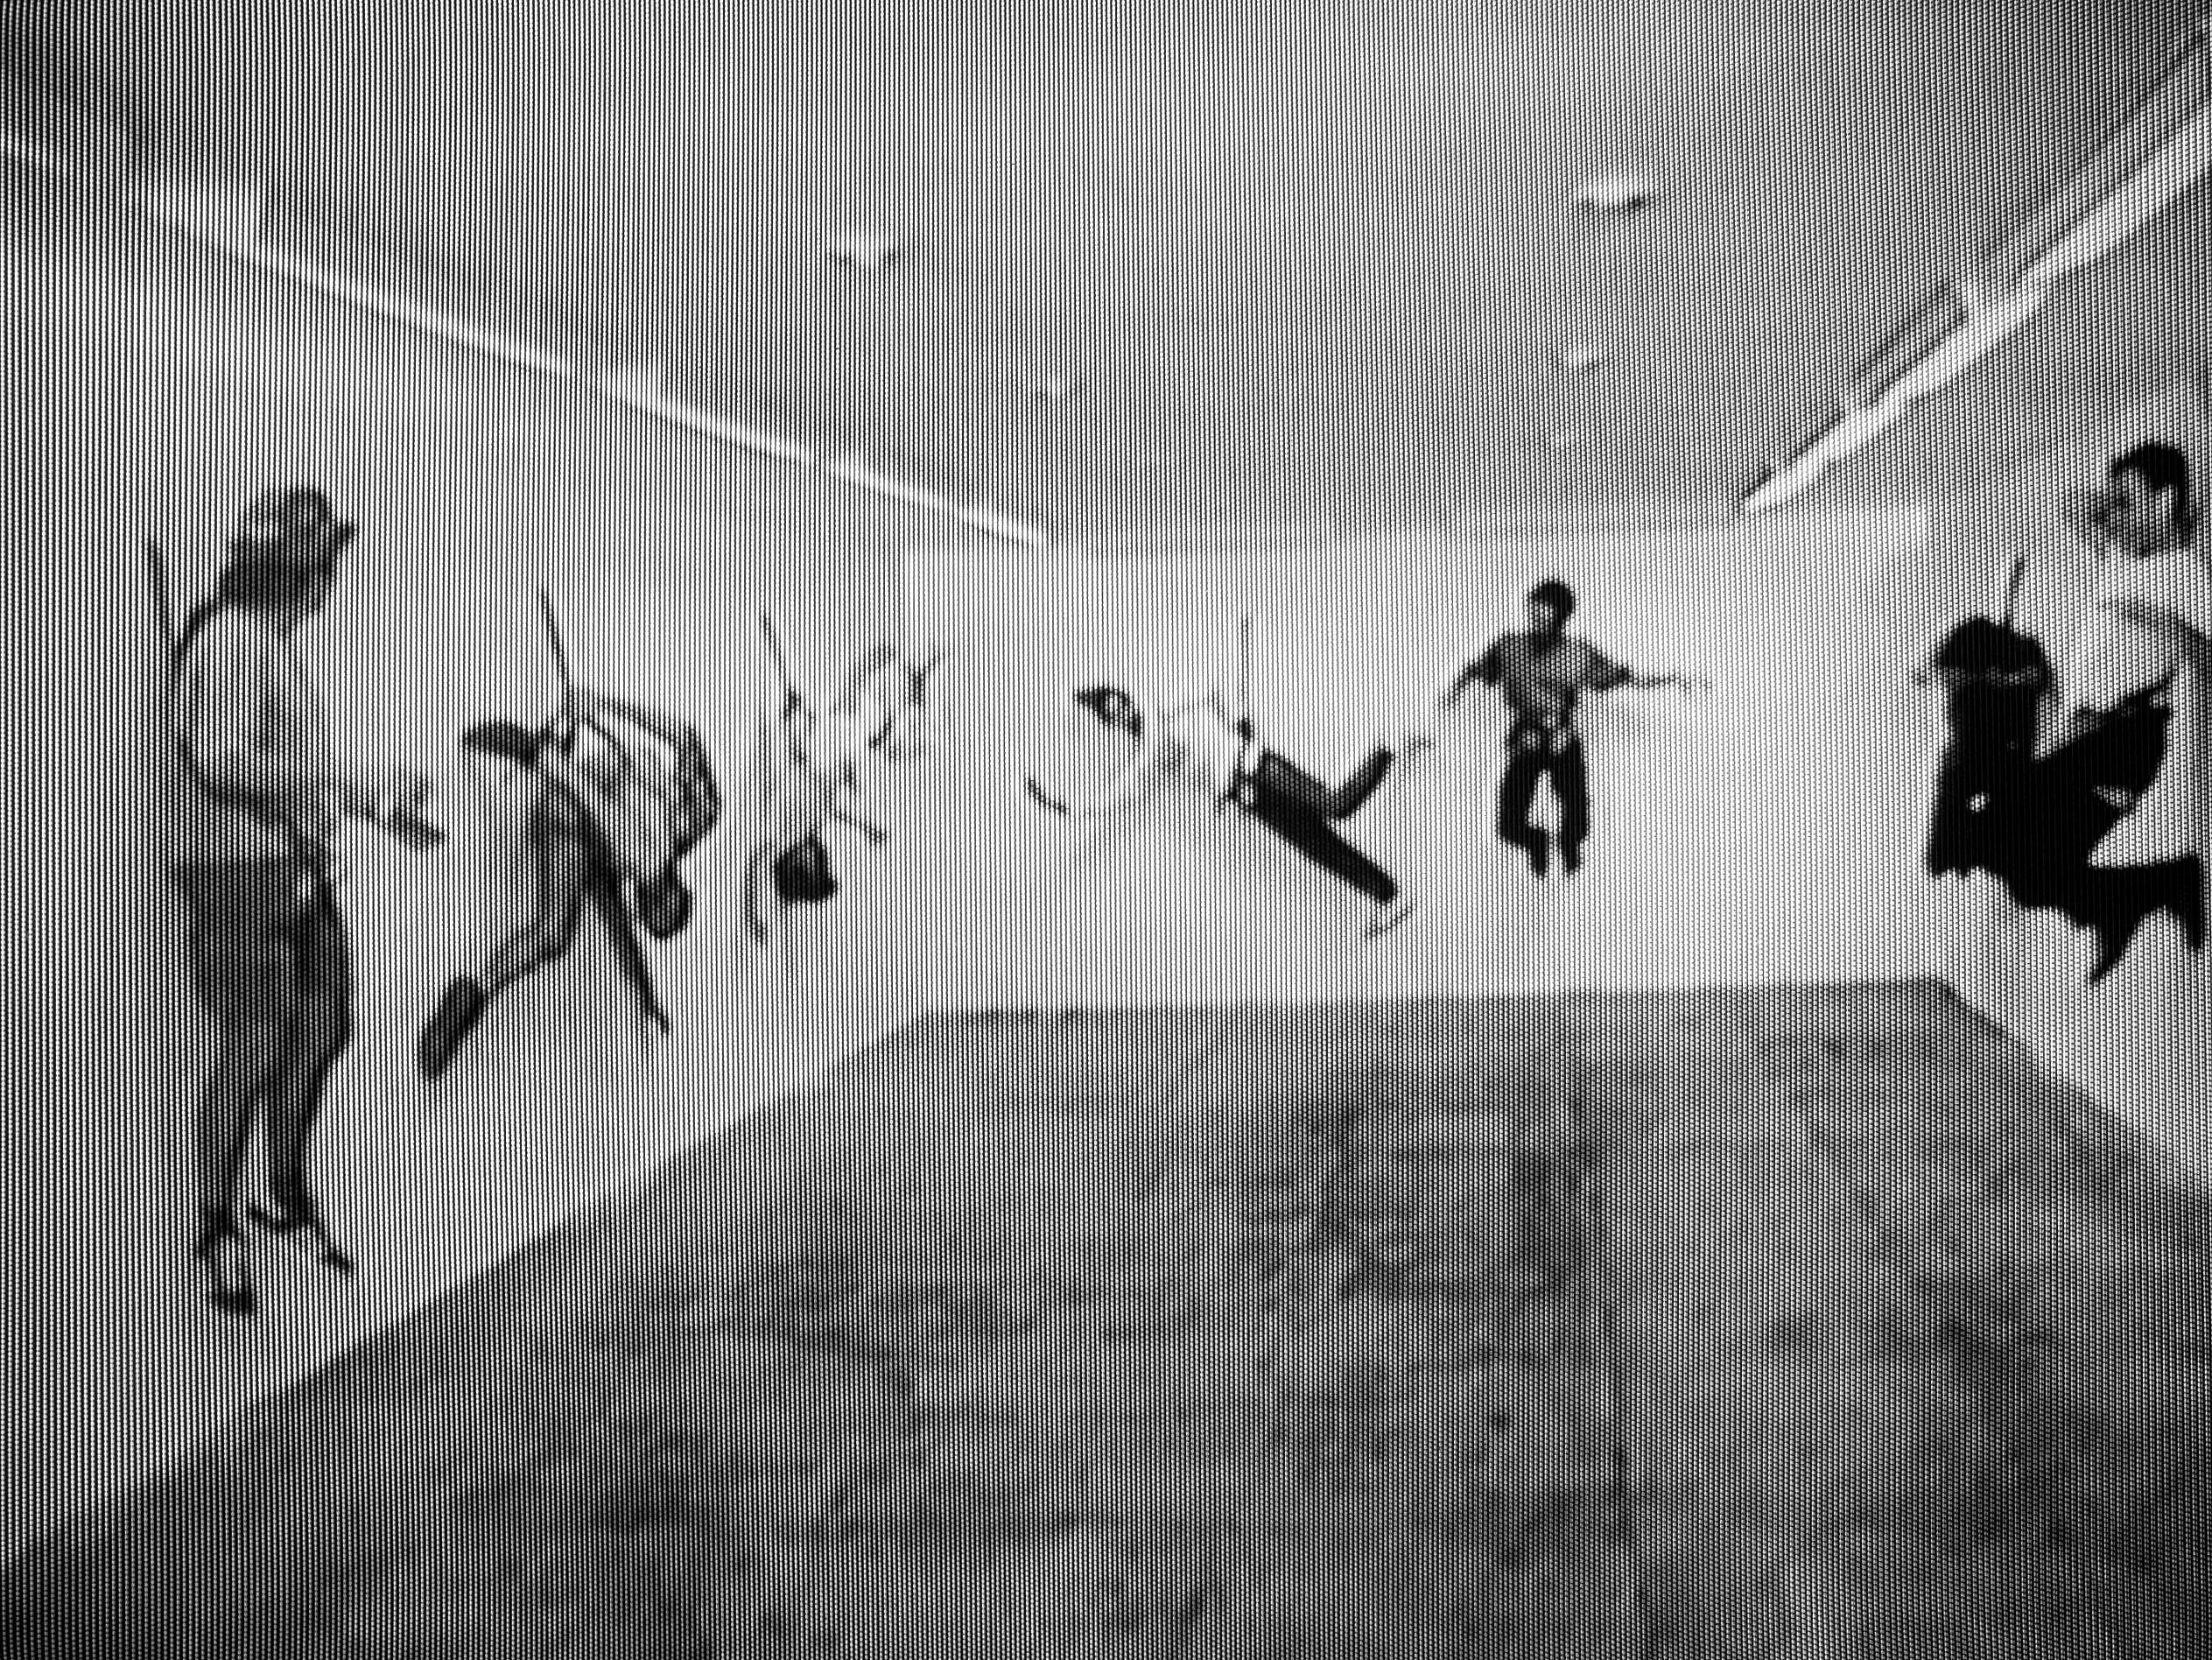 Raul Mourao 7 artists, 1995, digital video, black and white, sound,1' (still da video)